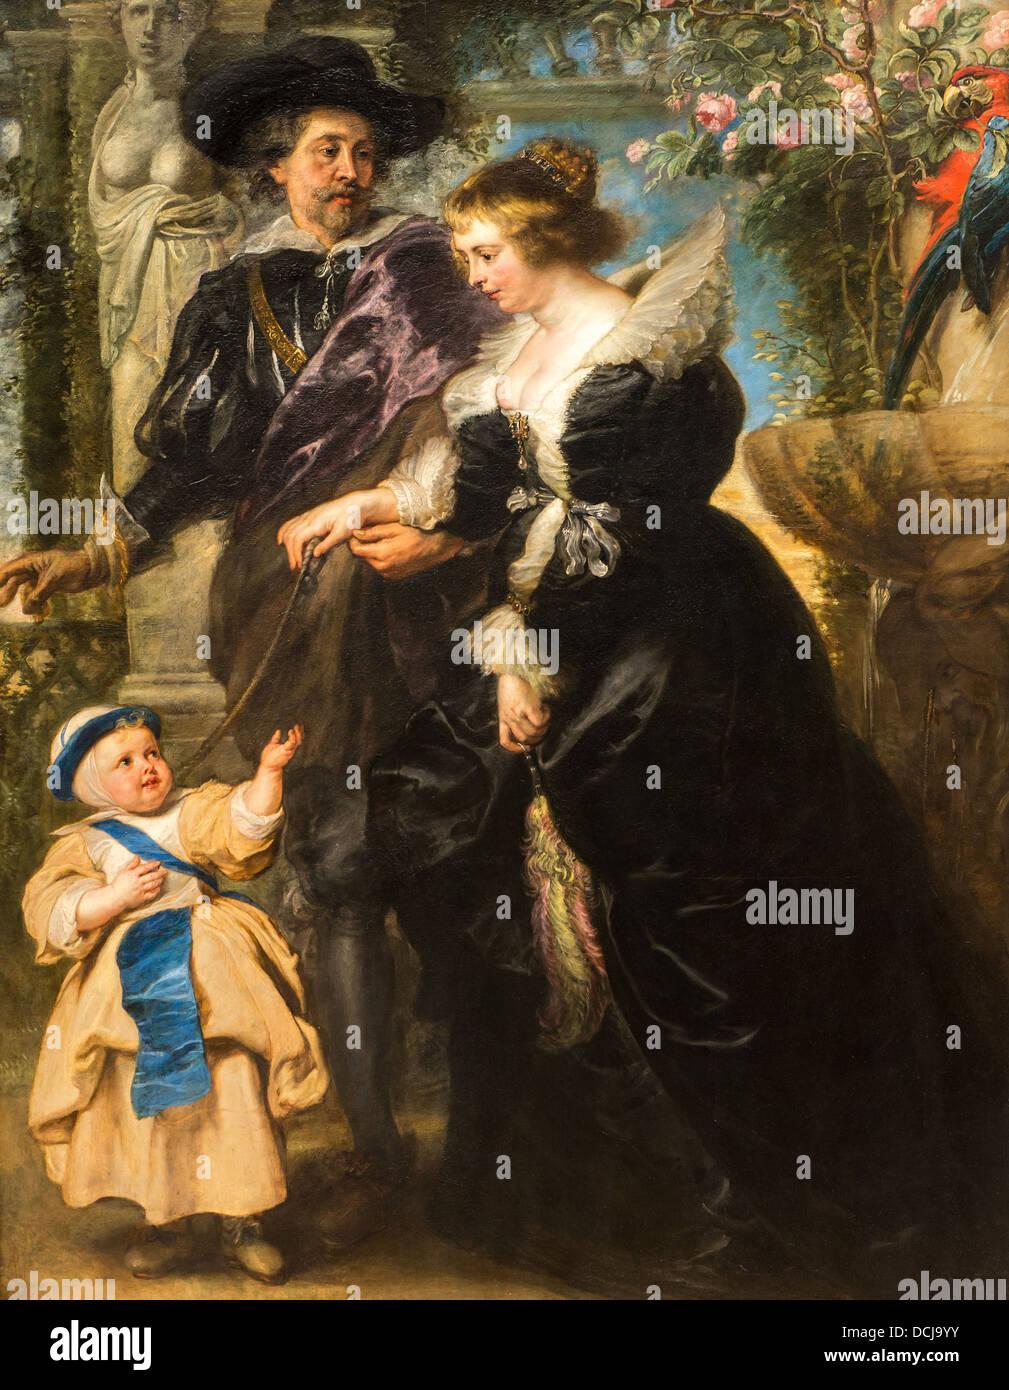 17 Jahrhundert Bild Architektur: Rubens Painting Stockfotos & Rubens Painting Bilder